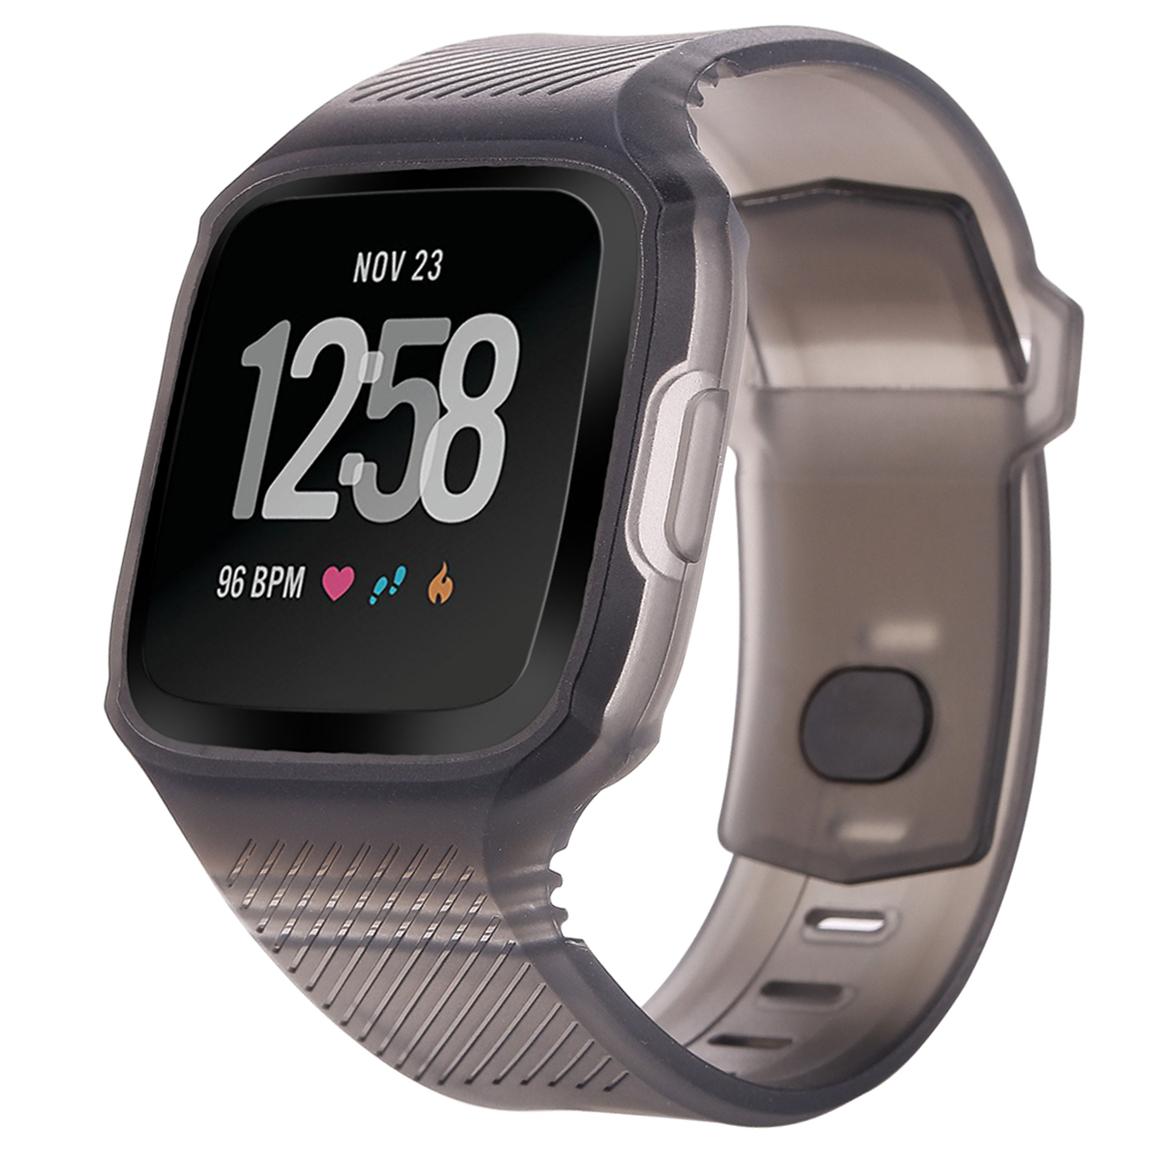 Moretek Strap for Fitbit Versa Scratch Resistant TPU Protective Frame Case Band Replacement Wristband Straps for Fitbit Versa Health Fitness Smartwatch Protect Bracelet Bands (Black)